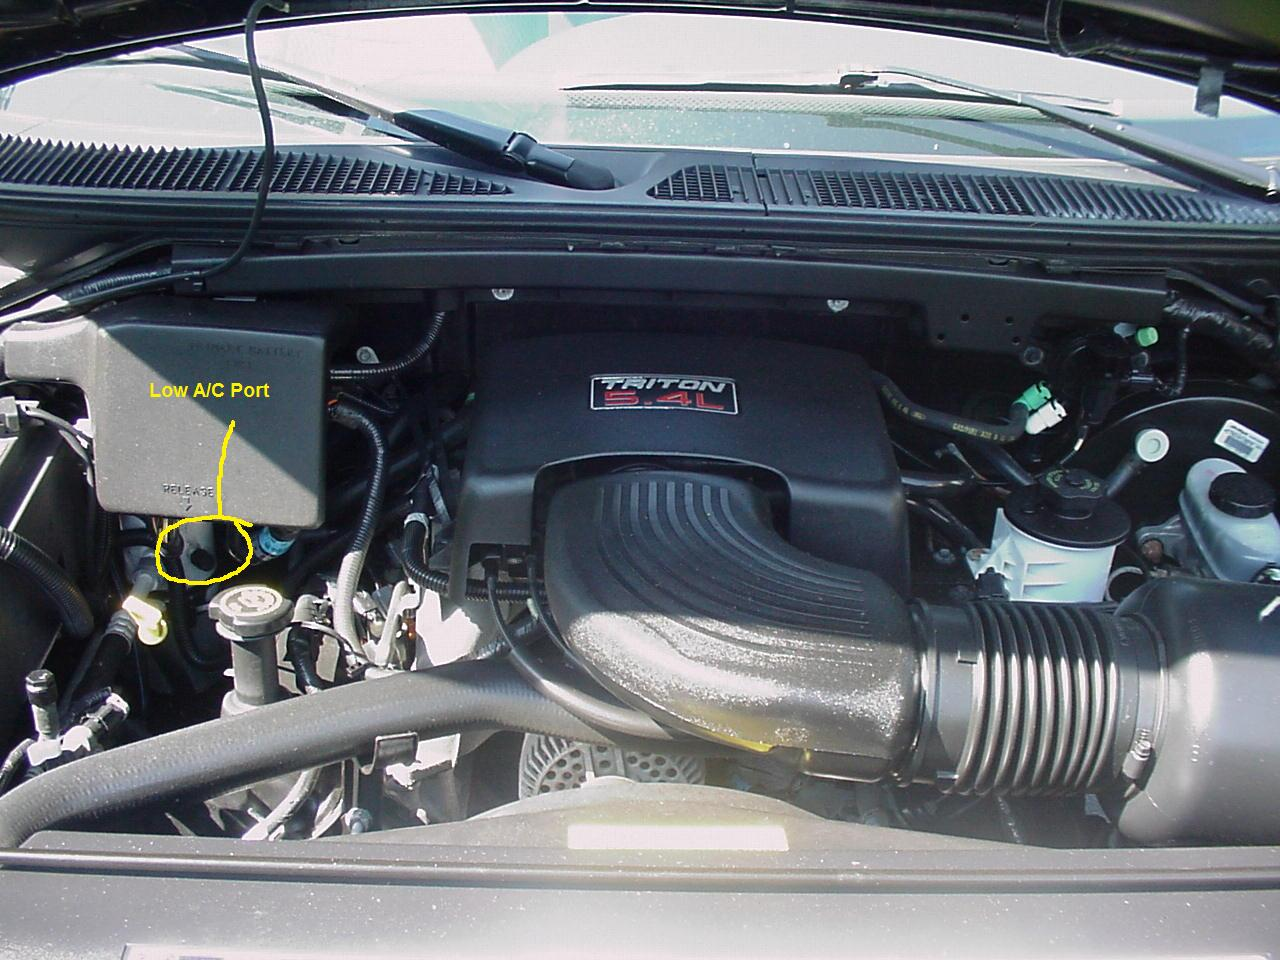 2002 F250 Keyless Entry Location Autos Weblog #4E707D